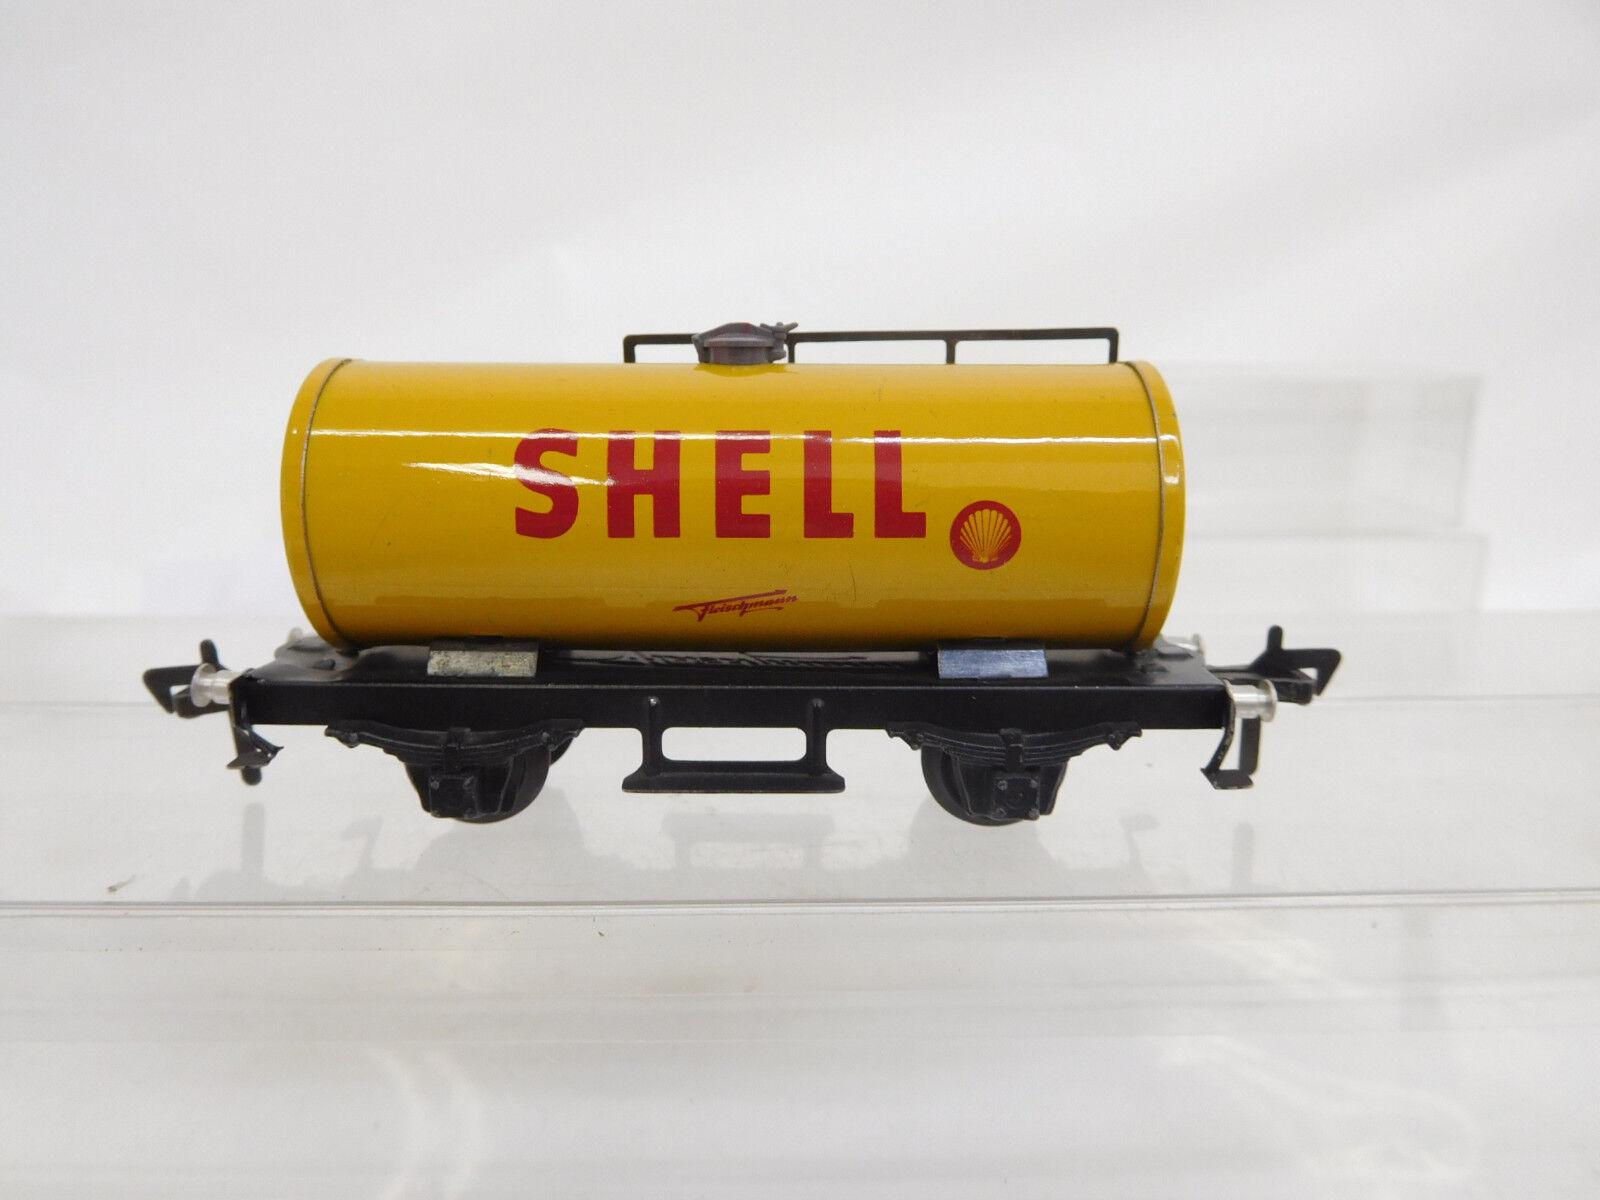 Eso-7730 Fleischmann h0 Caldaia Carrello Shell con minimi segni di usura,